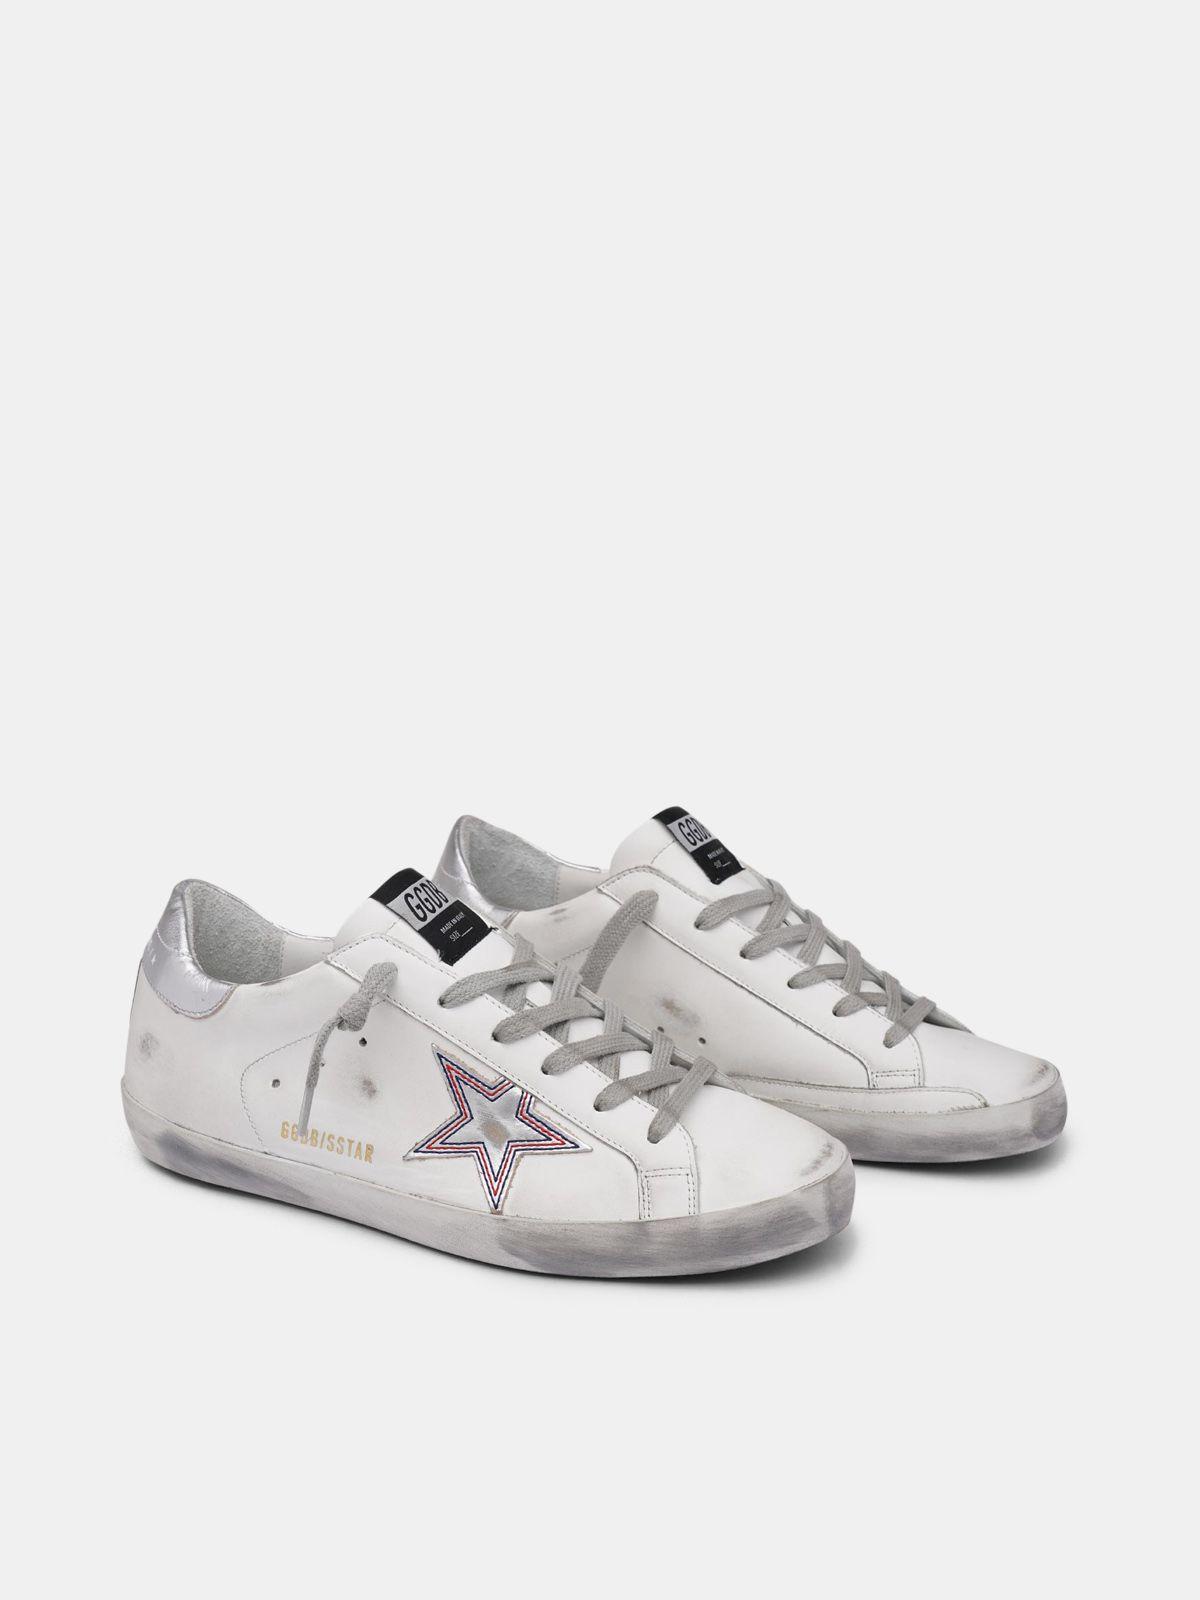 Golden Goose - Sneakers Super-Star stella argentata con stitching a contrasto in